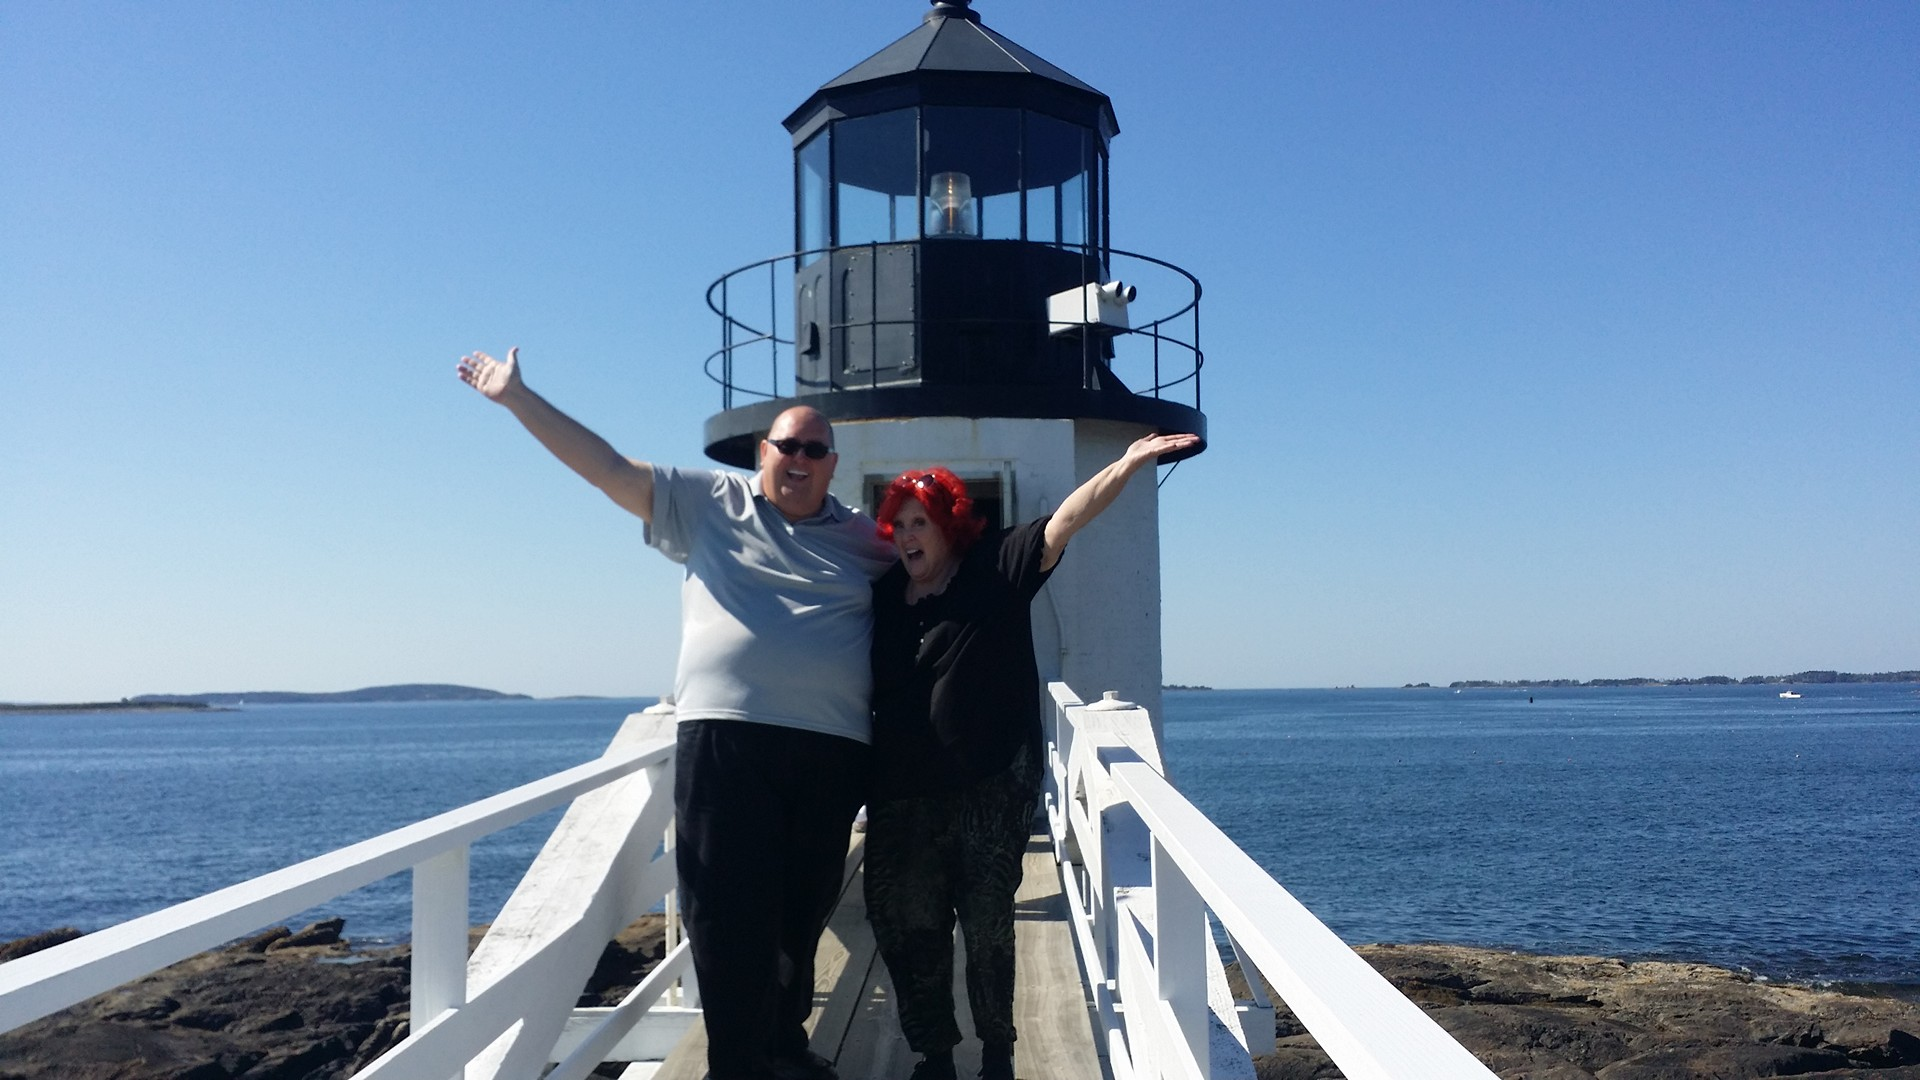 http://www.experienceofalifetimetours.com/wp-content/uploads/2015/09/TG-Lulu-Lighthouse1.jpg